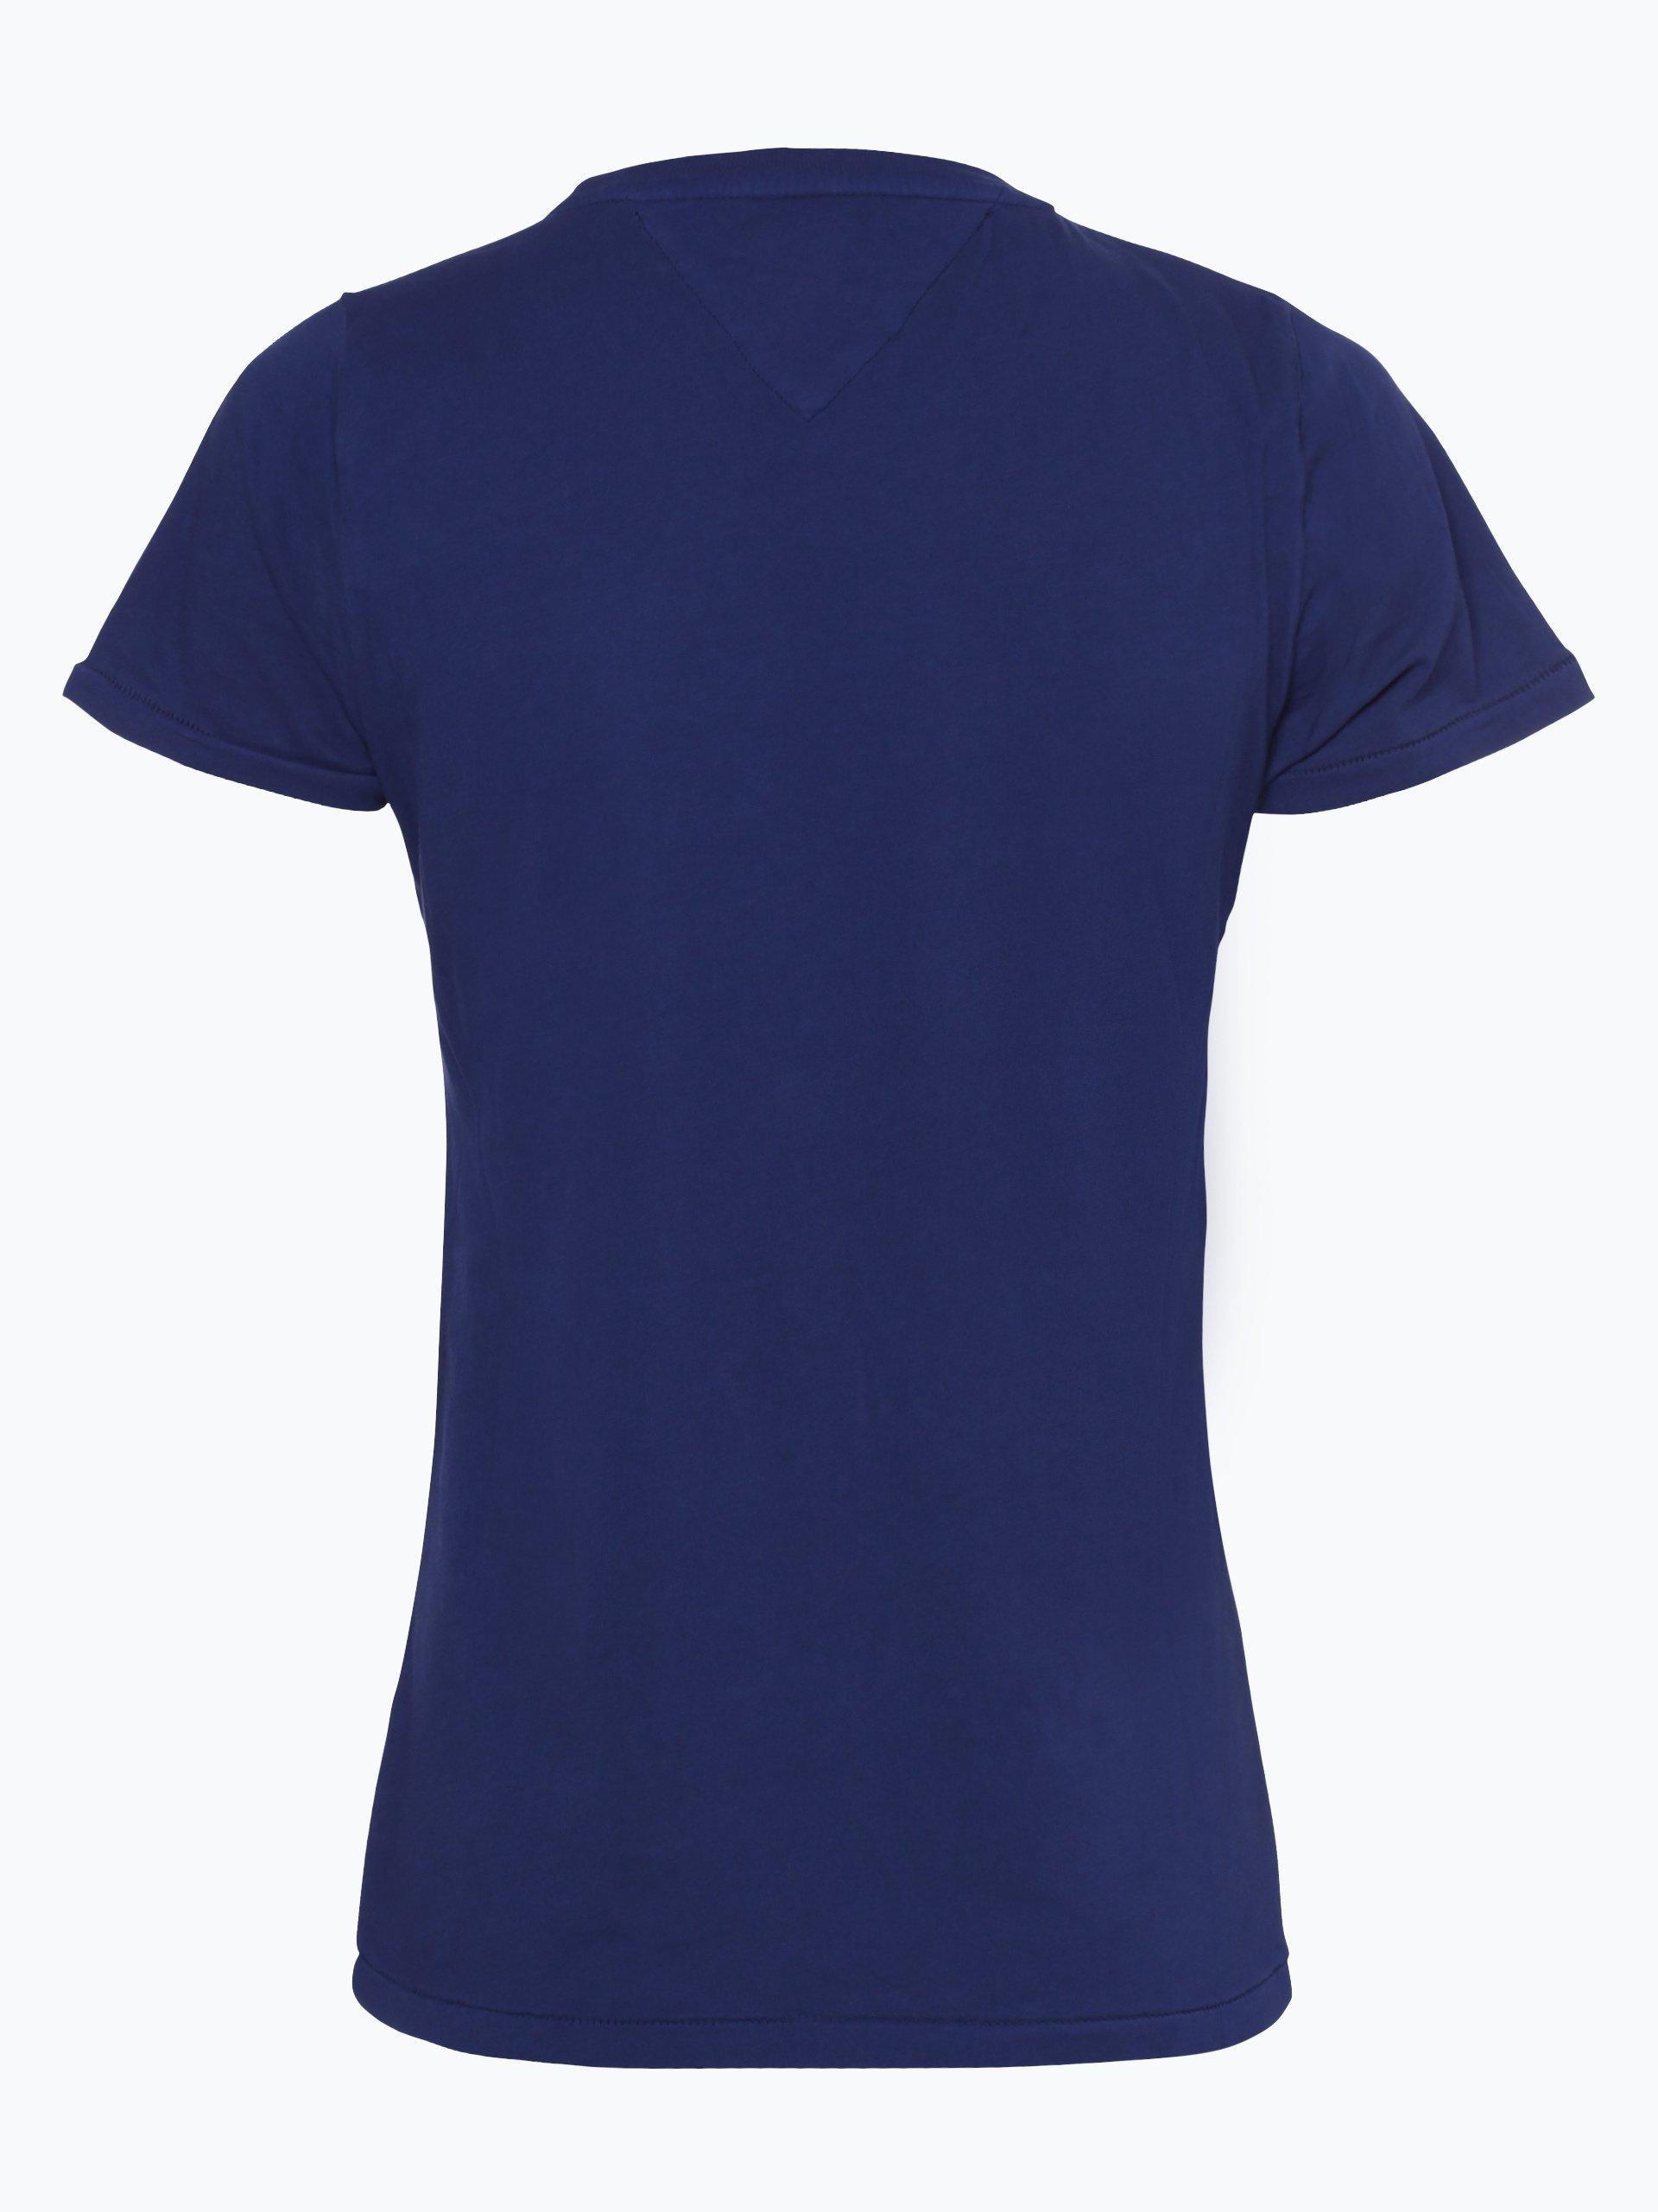 tommy jeans damen t shirt marine gemustert online kaufen. Black Bedroom Furniture Sets. Home Design Ideas